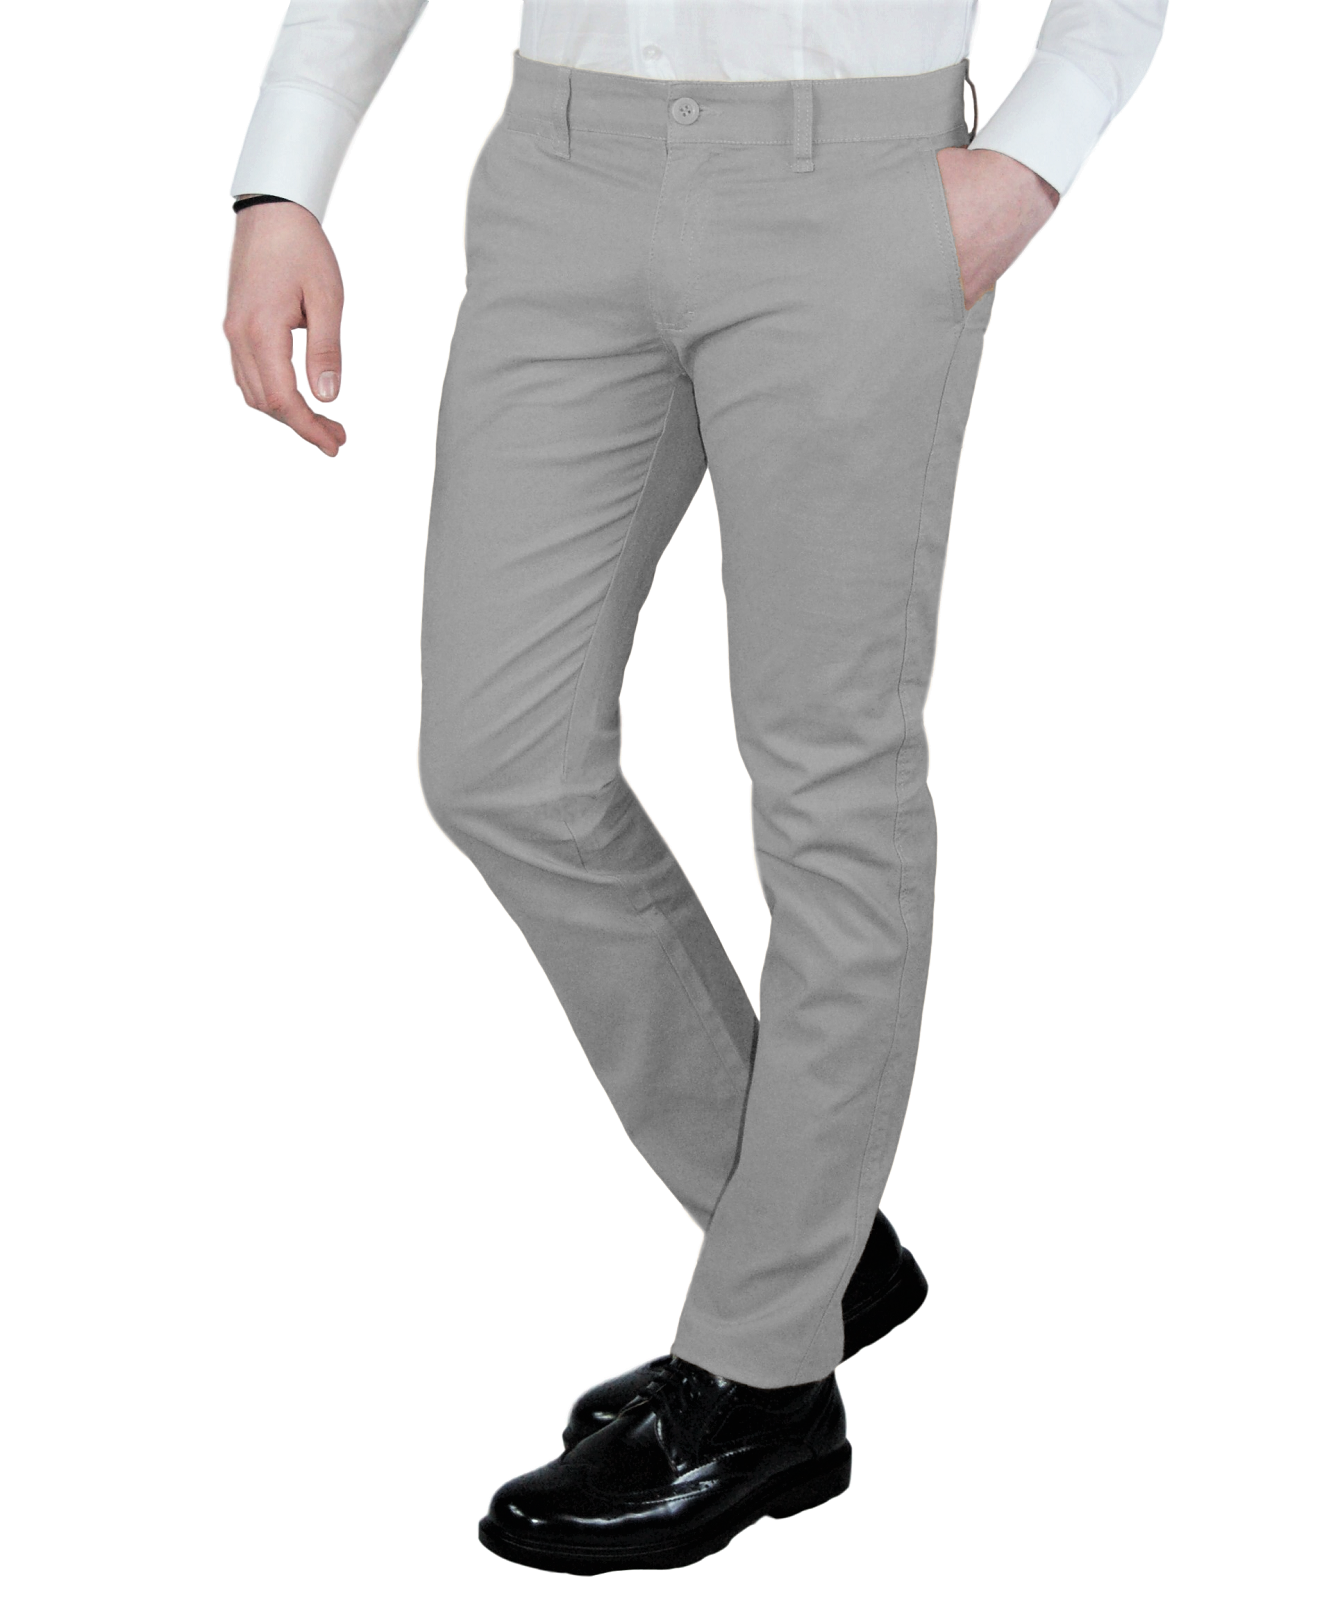 Pantalone-Uomo-Chino-Invernale-slim-fit-Pantaloni-Eleganti-Blu-Verde-Nero miniatura 34